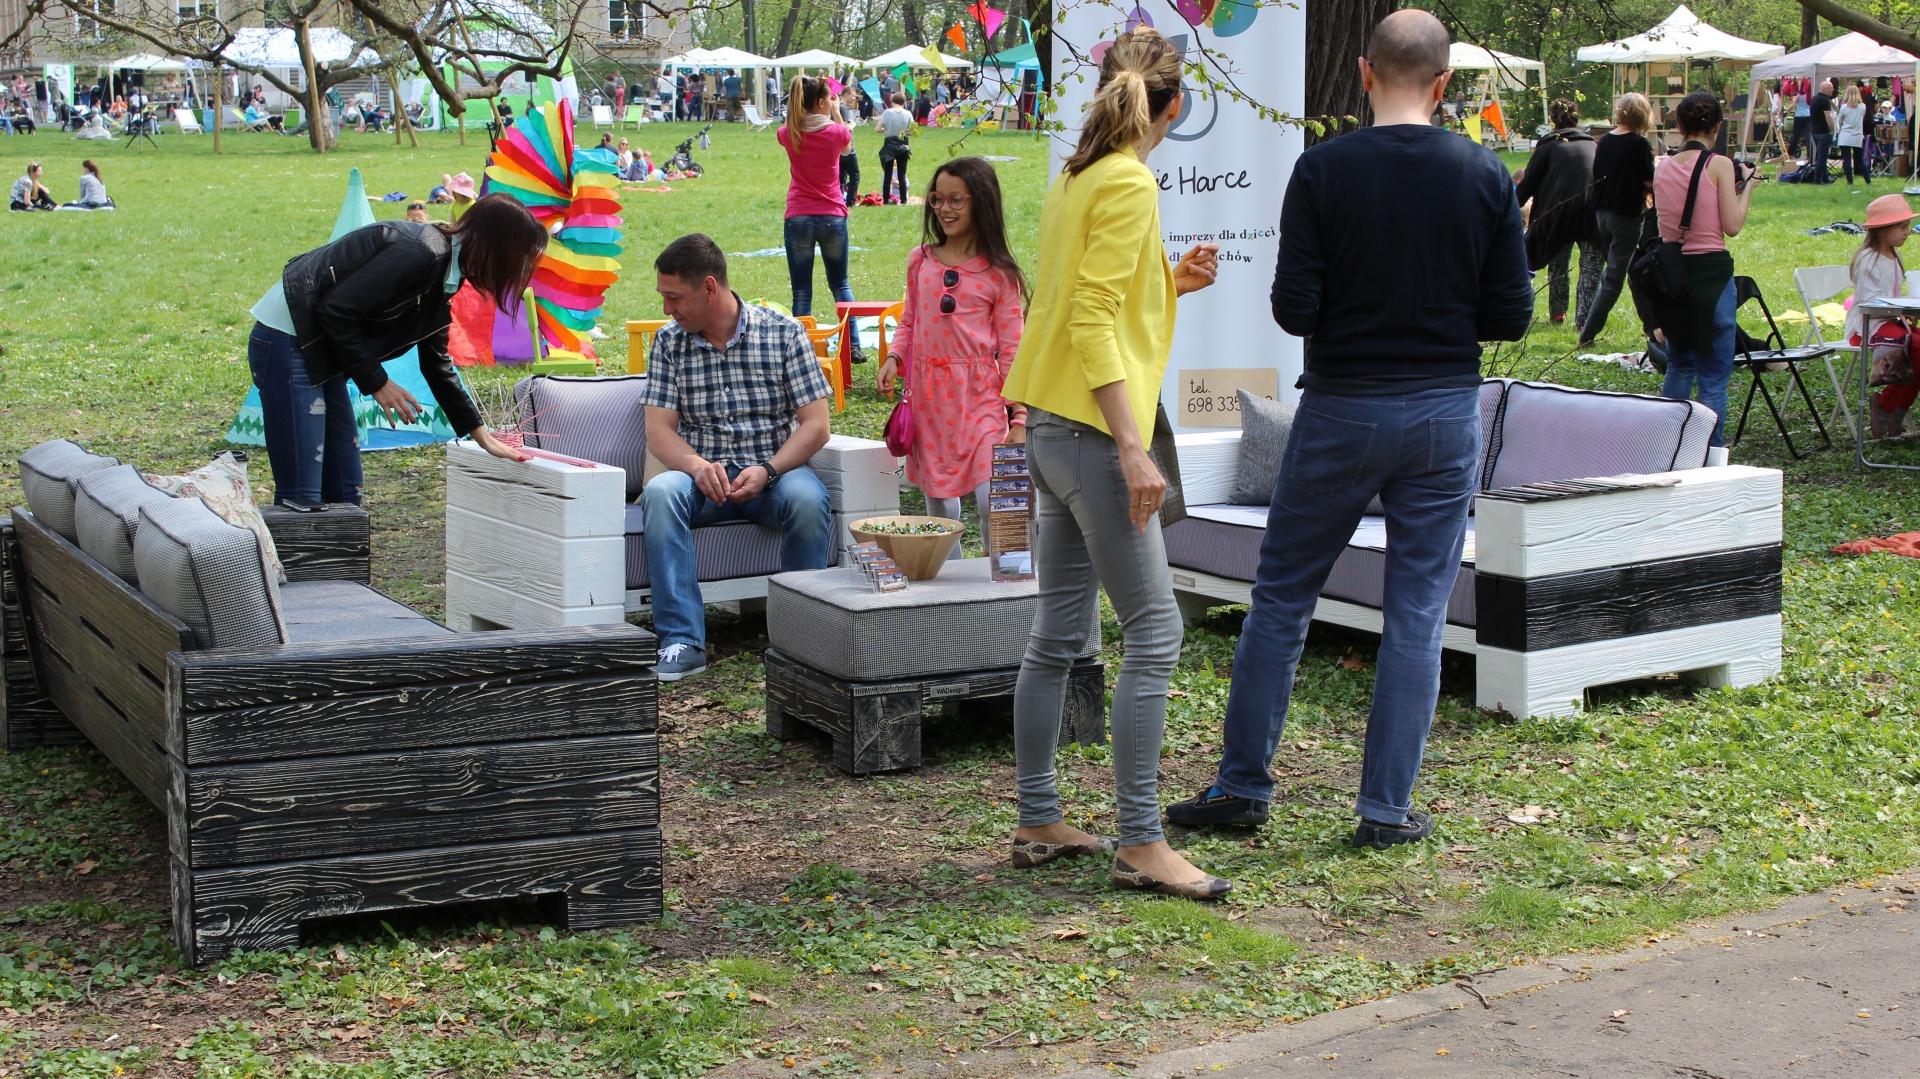 Meble ogrodowe WaDesign. Fot. Piotr Sawczuk